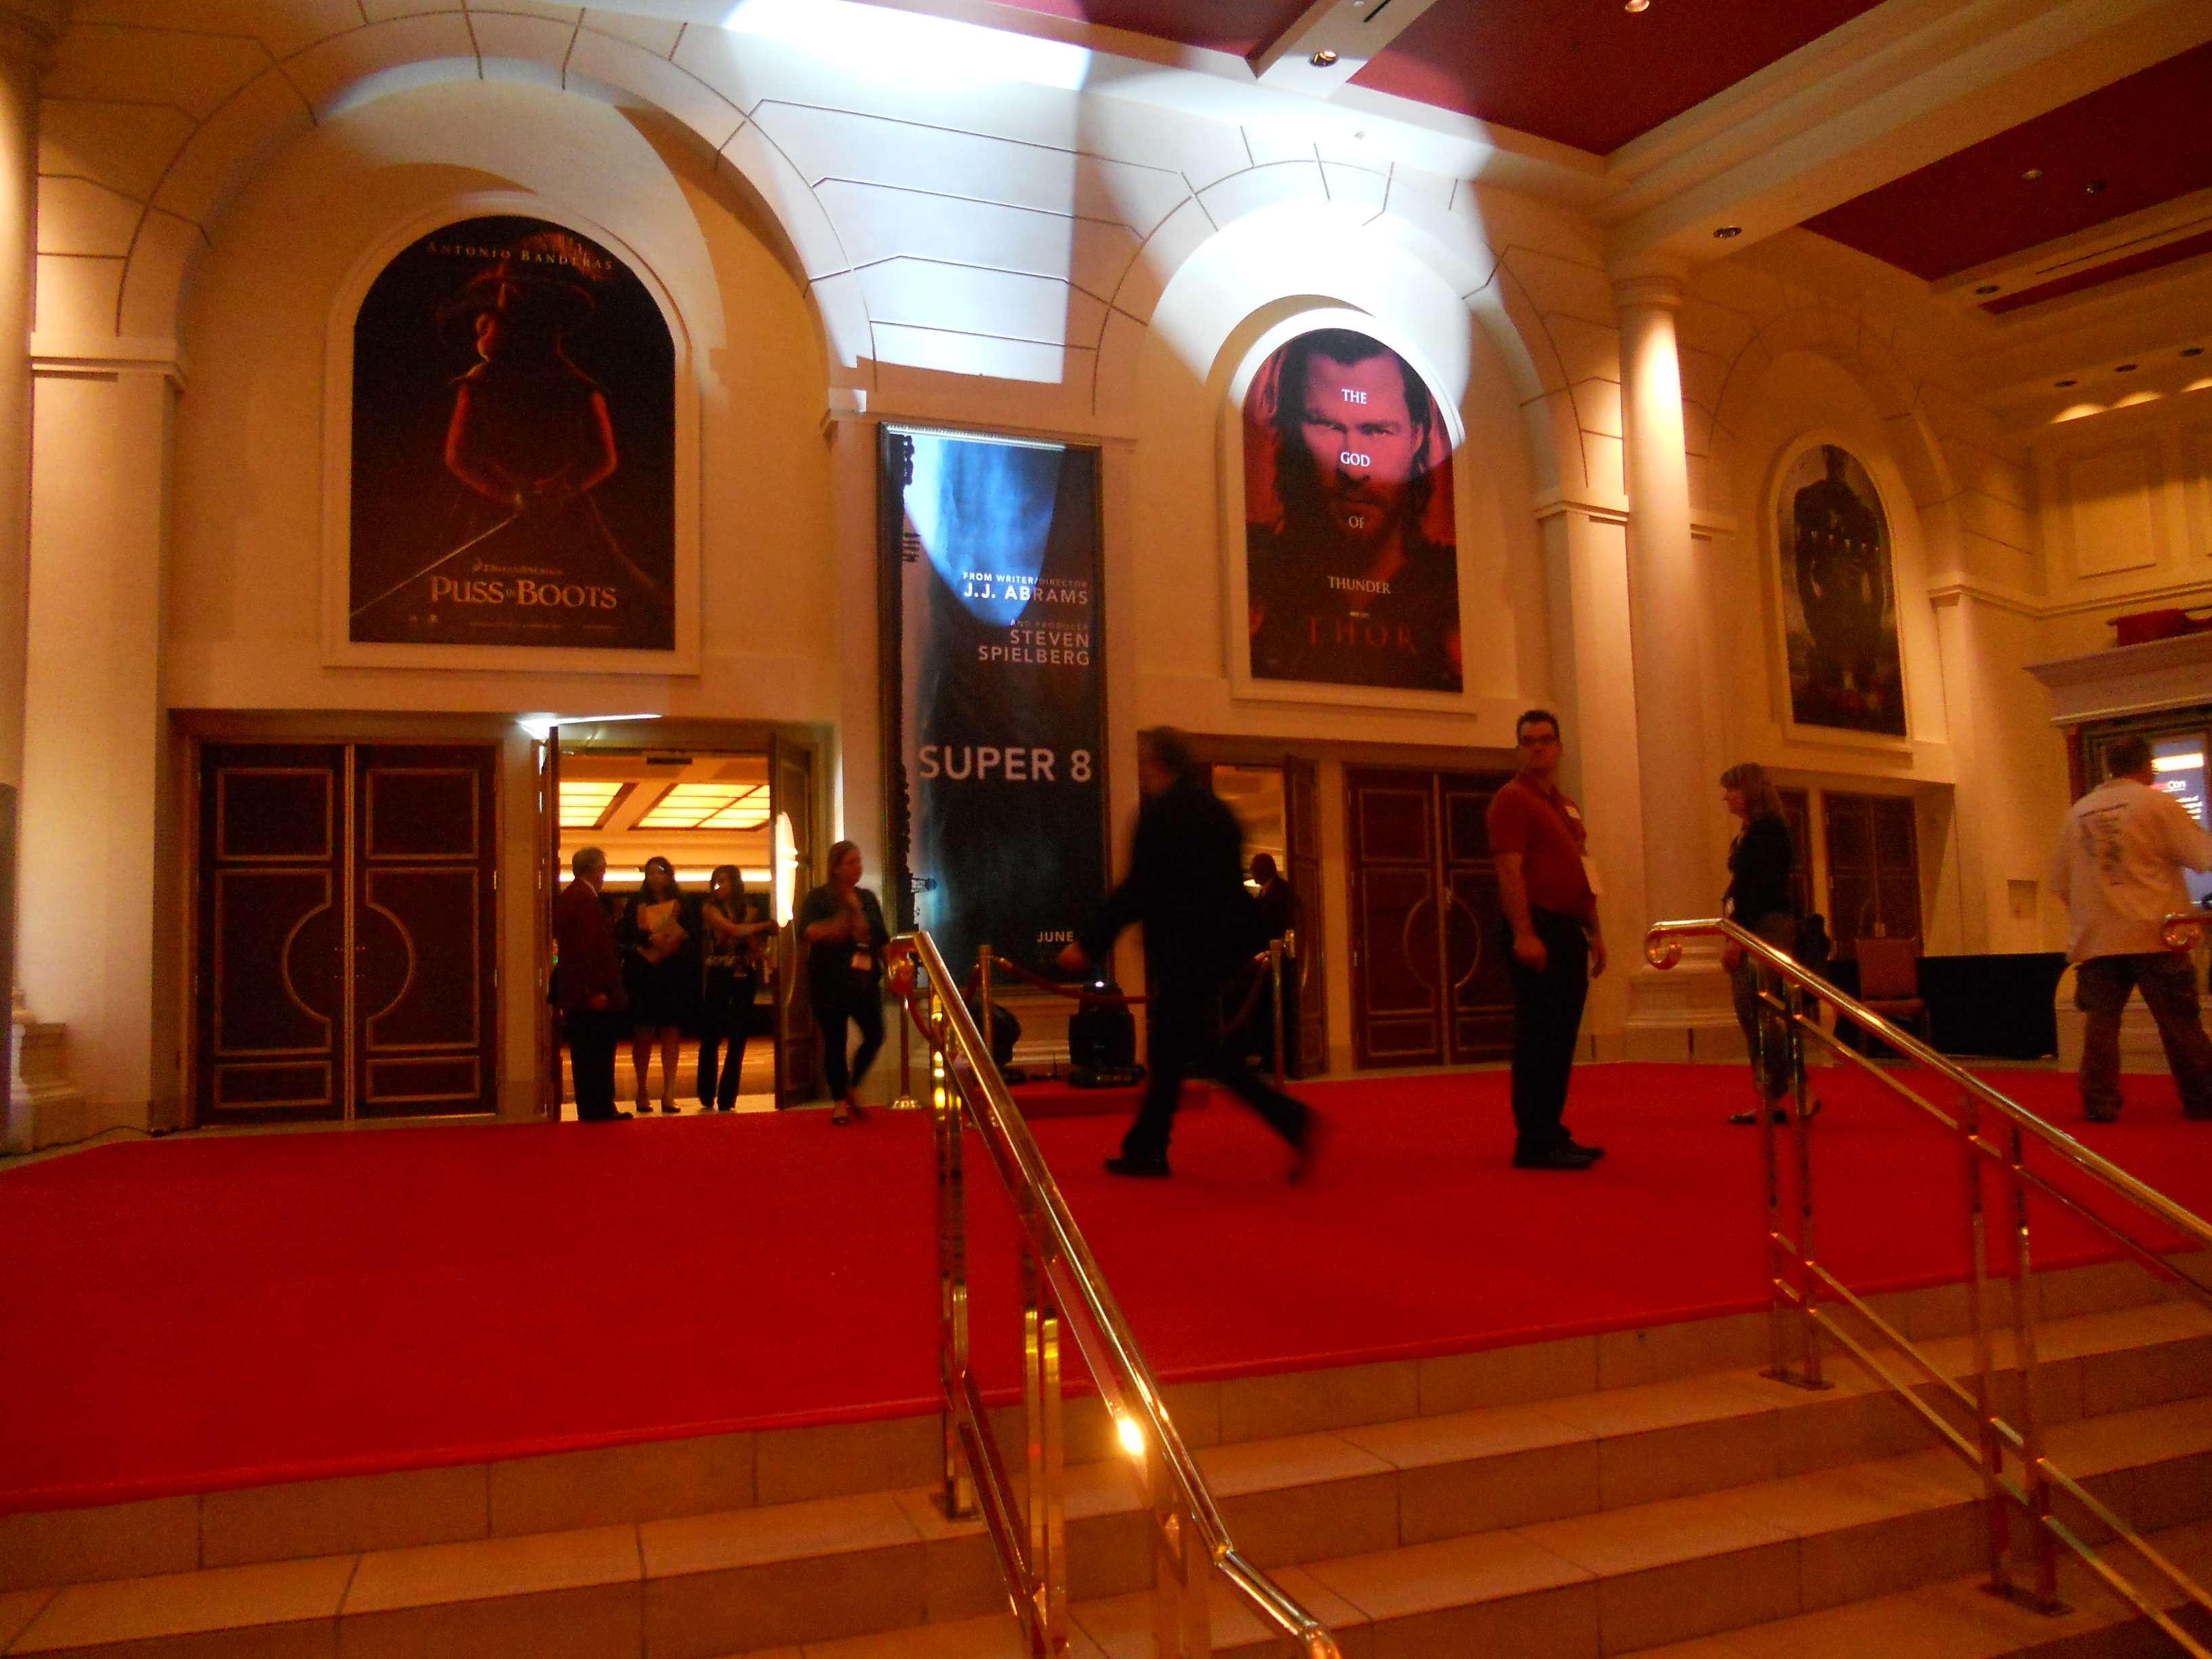 DSCN04681 CinemaCon 2011 at Caesars Palace, Las Vegas